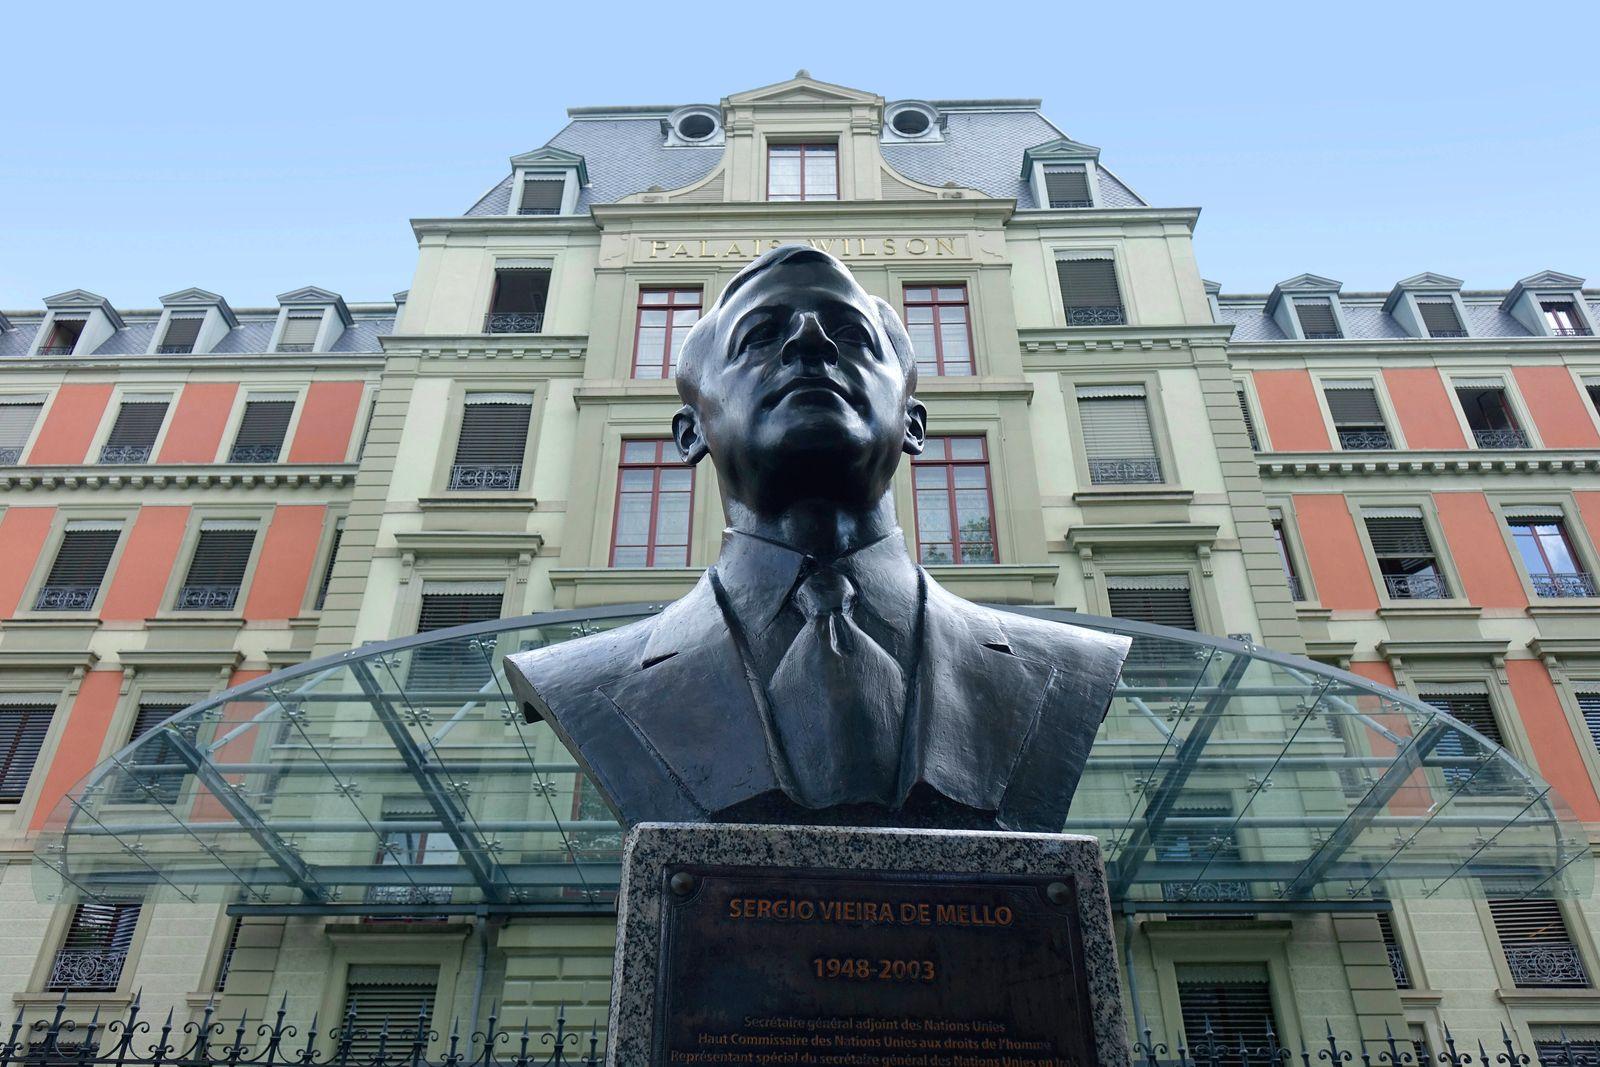 Palais Wilson Palais Wilson, 02.08.2019, Genf, Quai Wilson, Schweiz, Im Palais Wilson wird das Amt des Hohen Kommissars